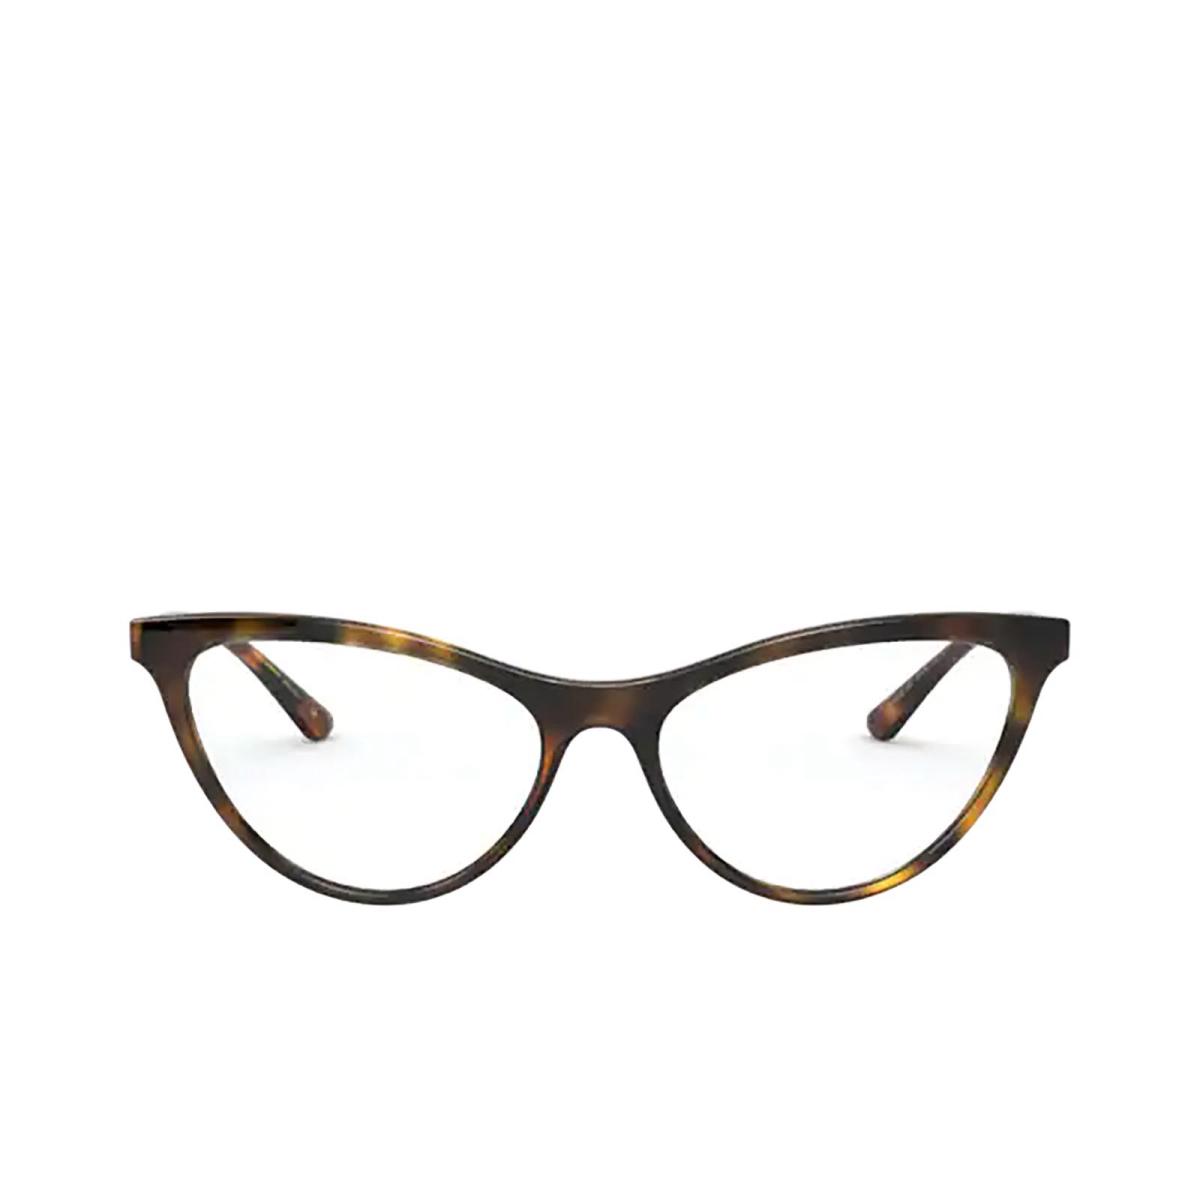 Dolce & Gabbana® Cat-eye Eyeglasses: DG5058 color Havana 502.